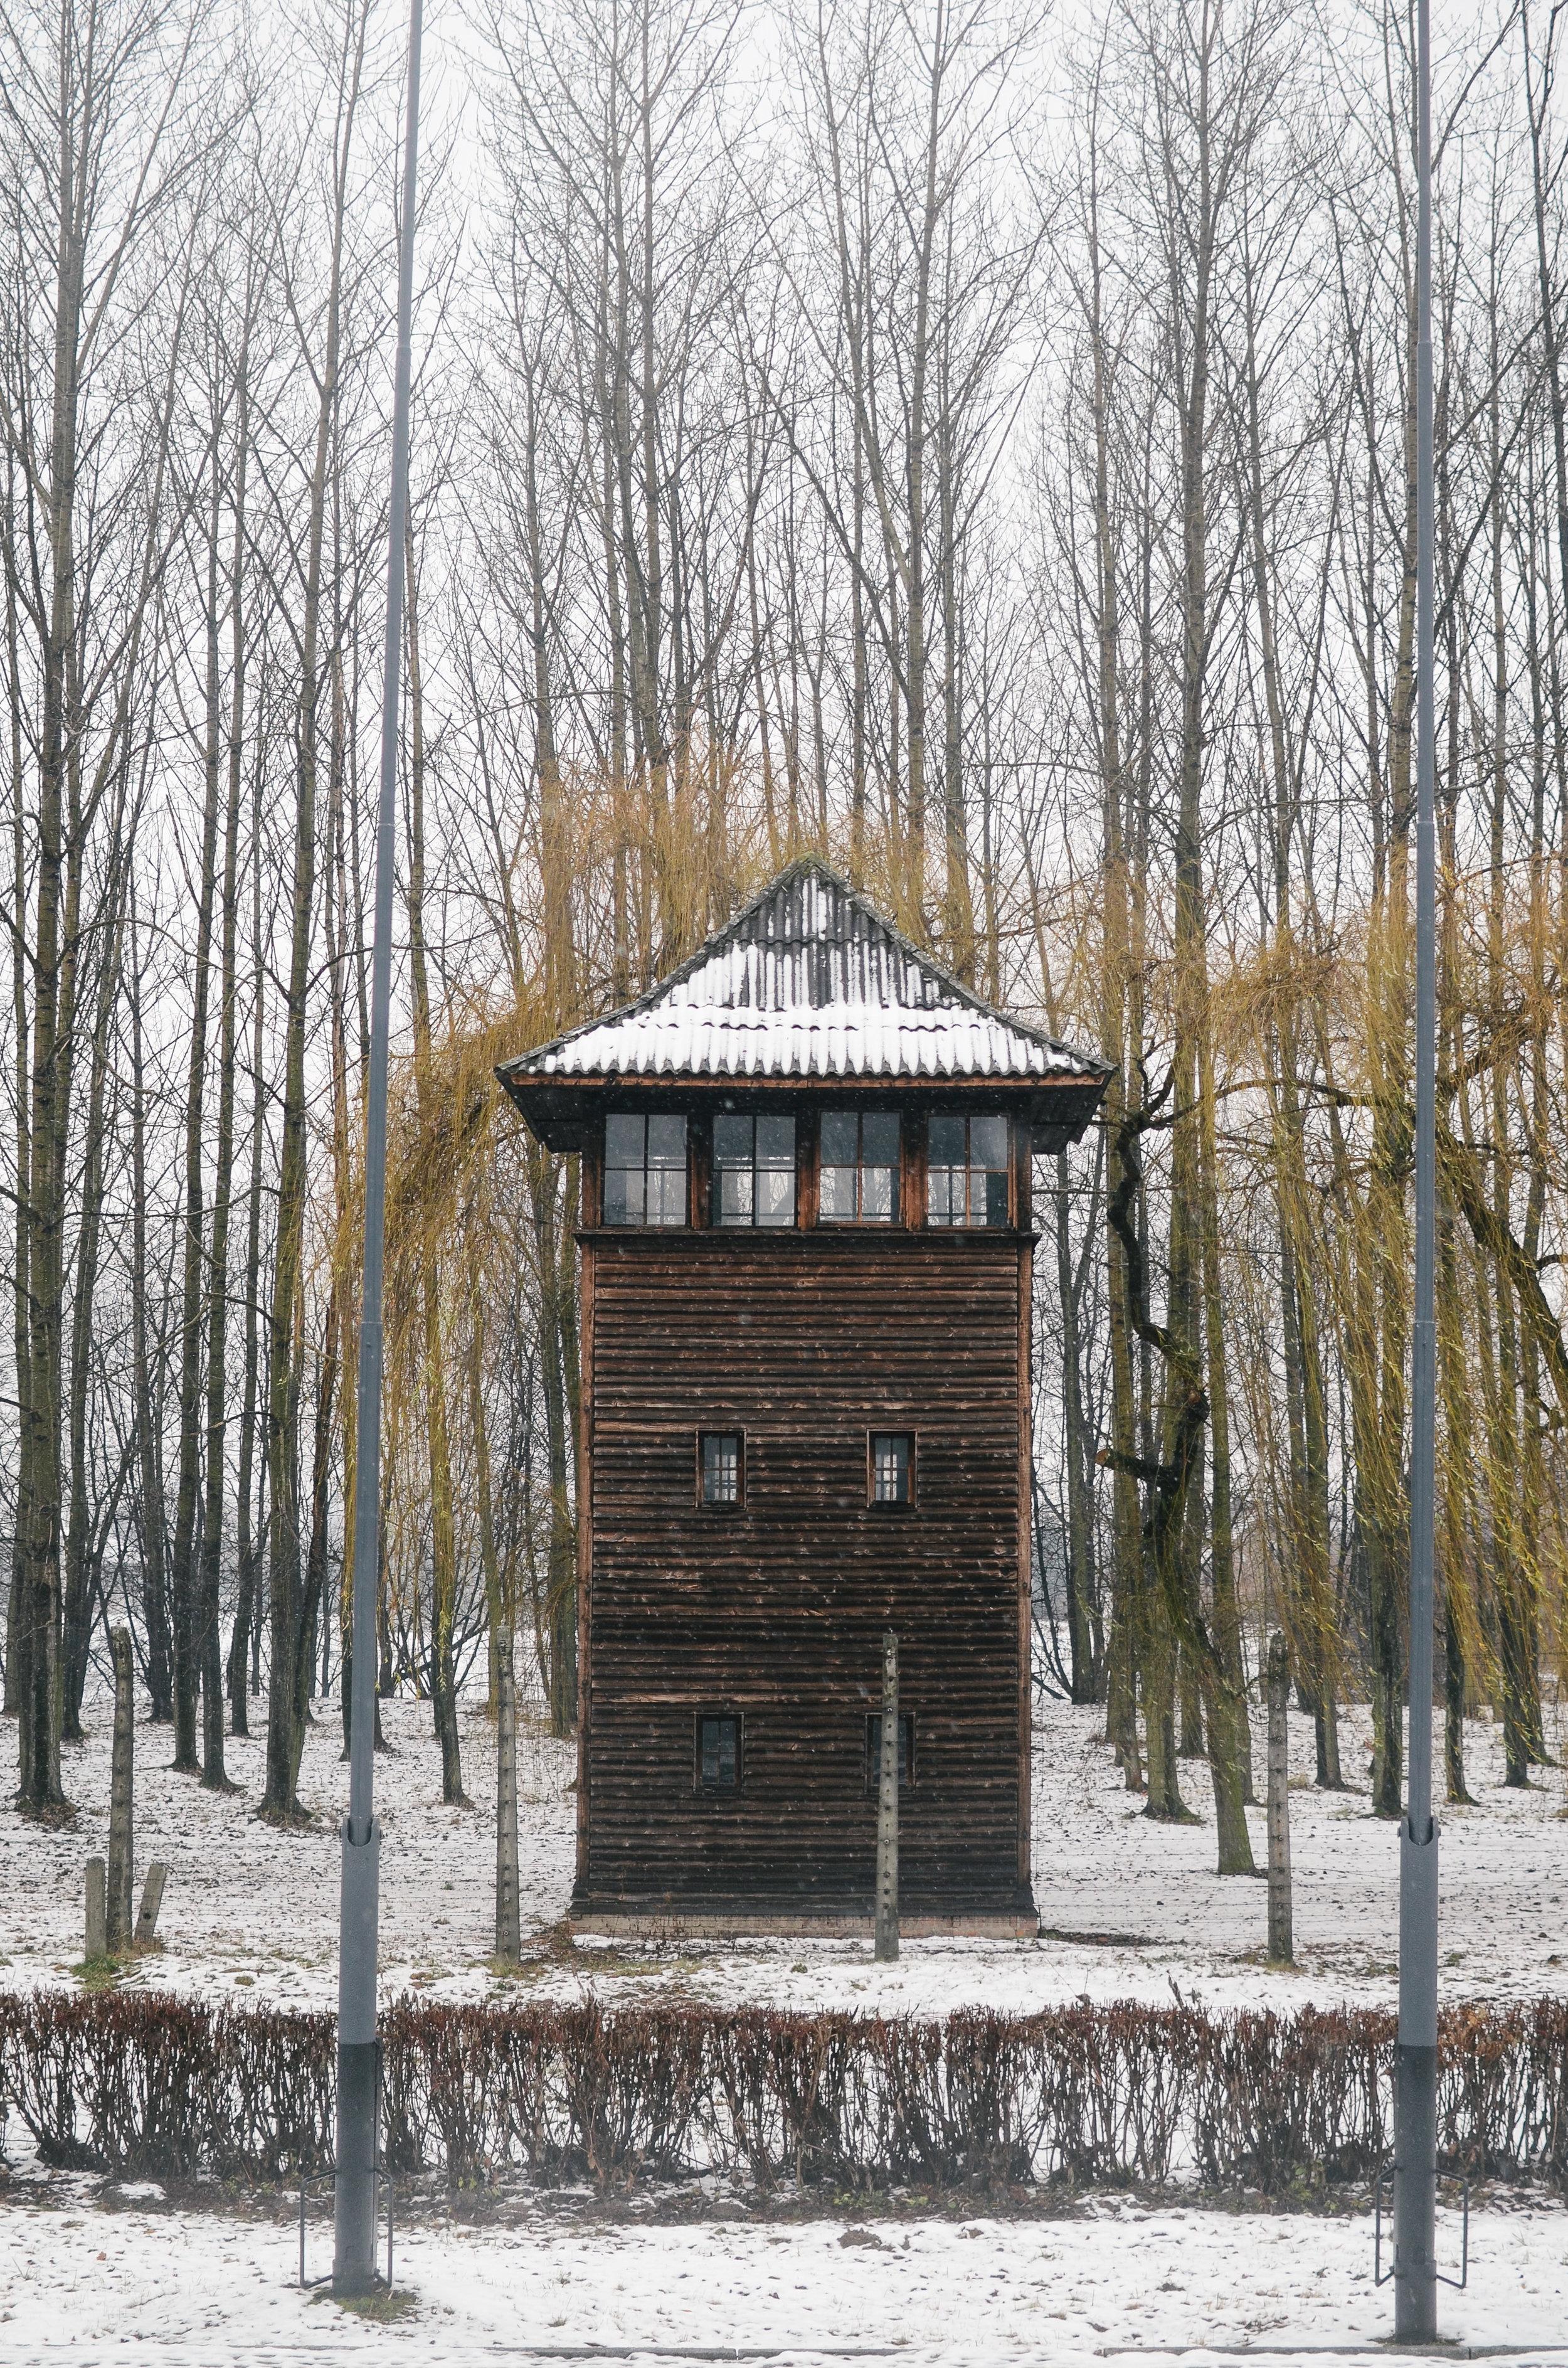 aushwitz-krakow-poland-travel-guide-lifeonpin_DSC_1049.jpg